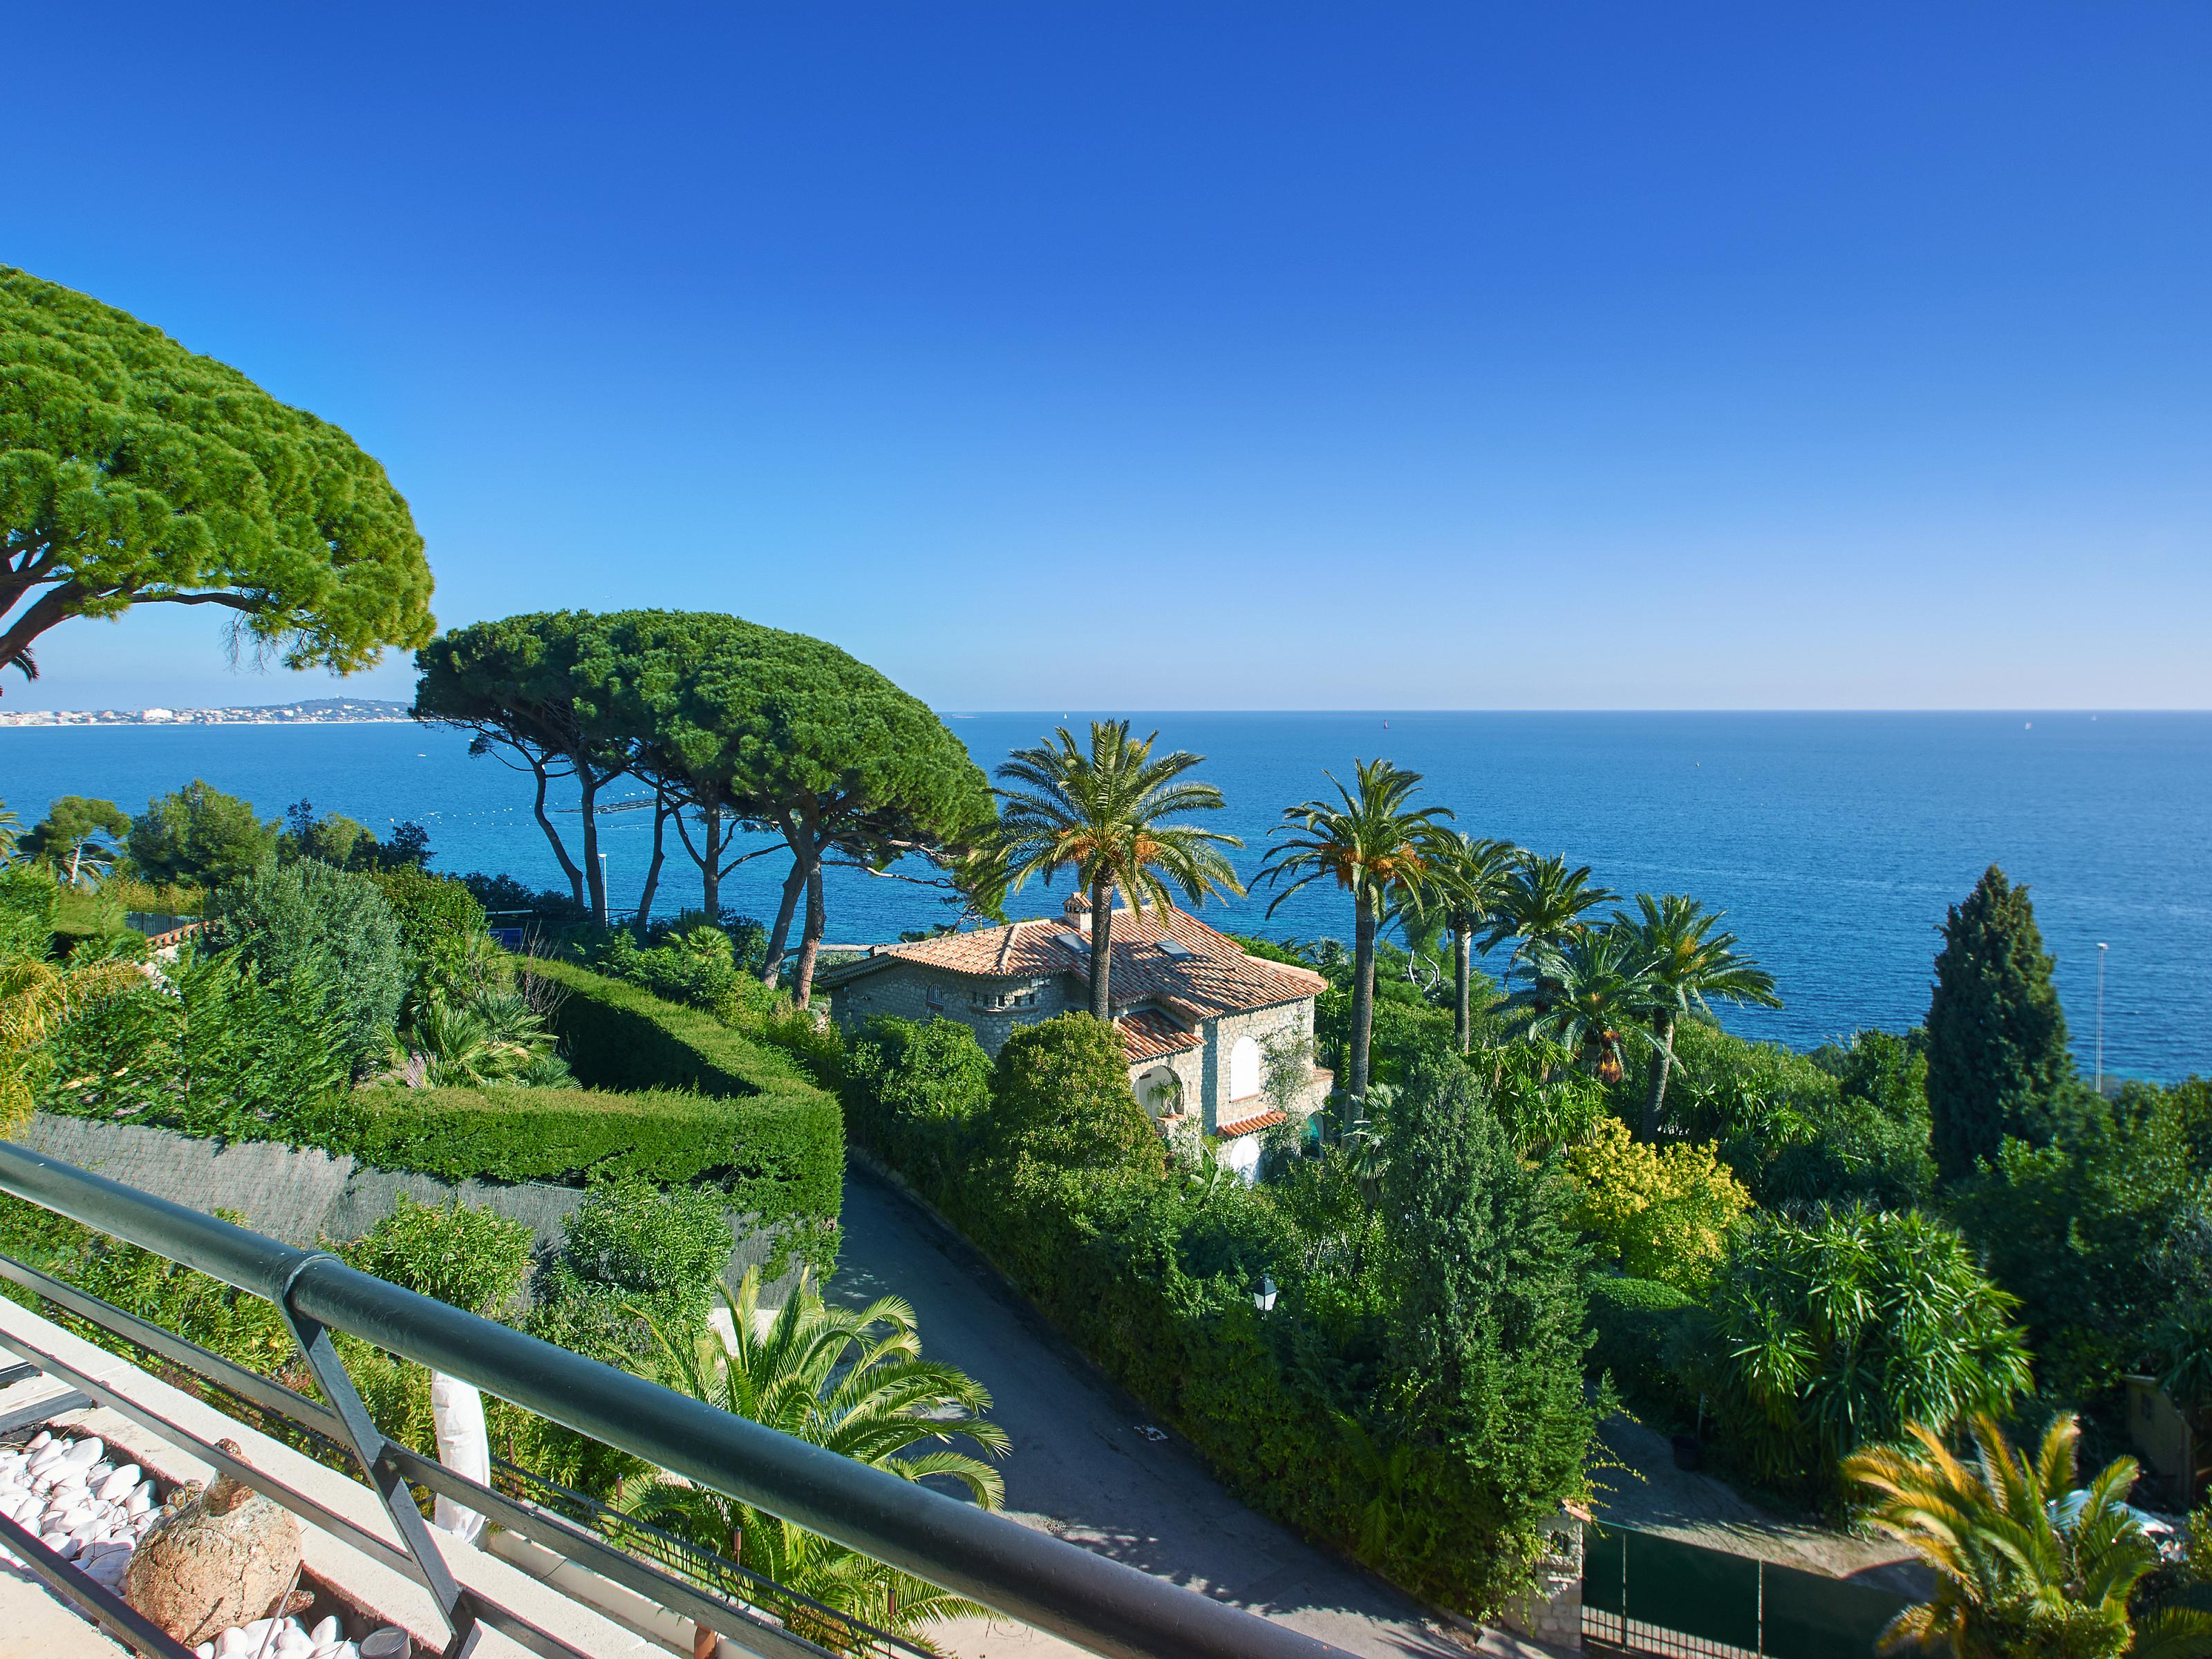 Nhà ở một gia đình vì Bán tại Penthouse - Cannes La Californie - Sea view Cannes, Provence-Alpes-Cote D'Azur 06400 Pháp